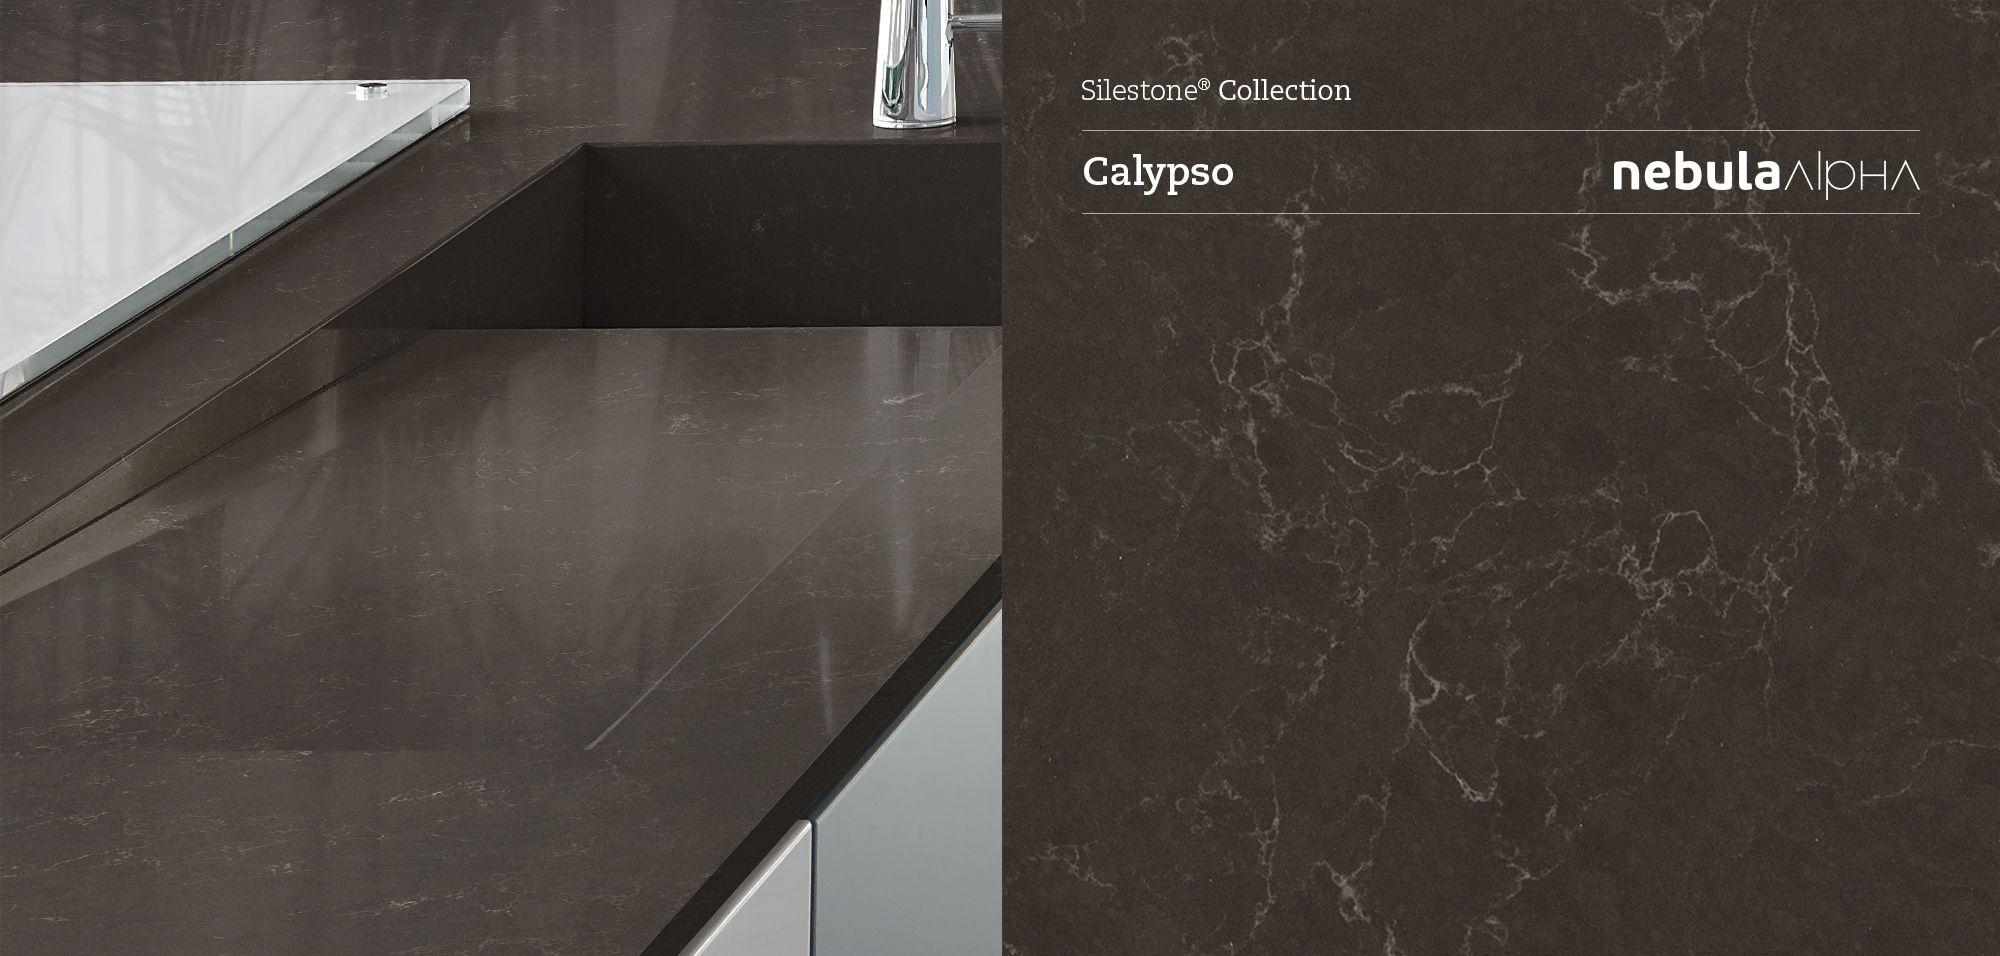 "Silestone CALYPSO ""Nebula Alpha Series: for the kitchen"